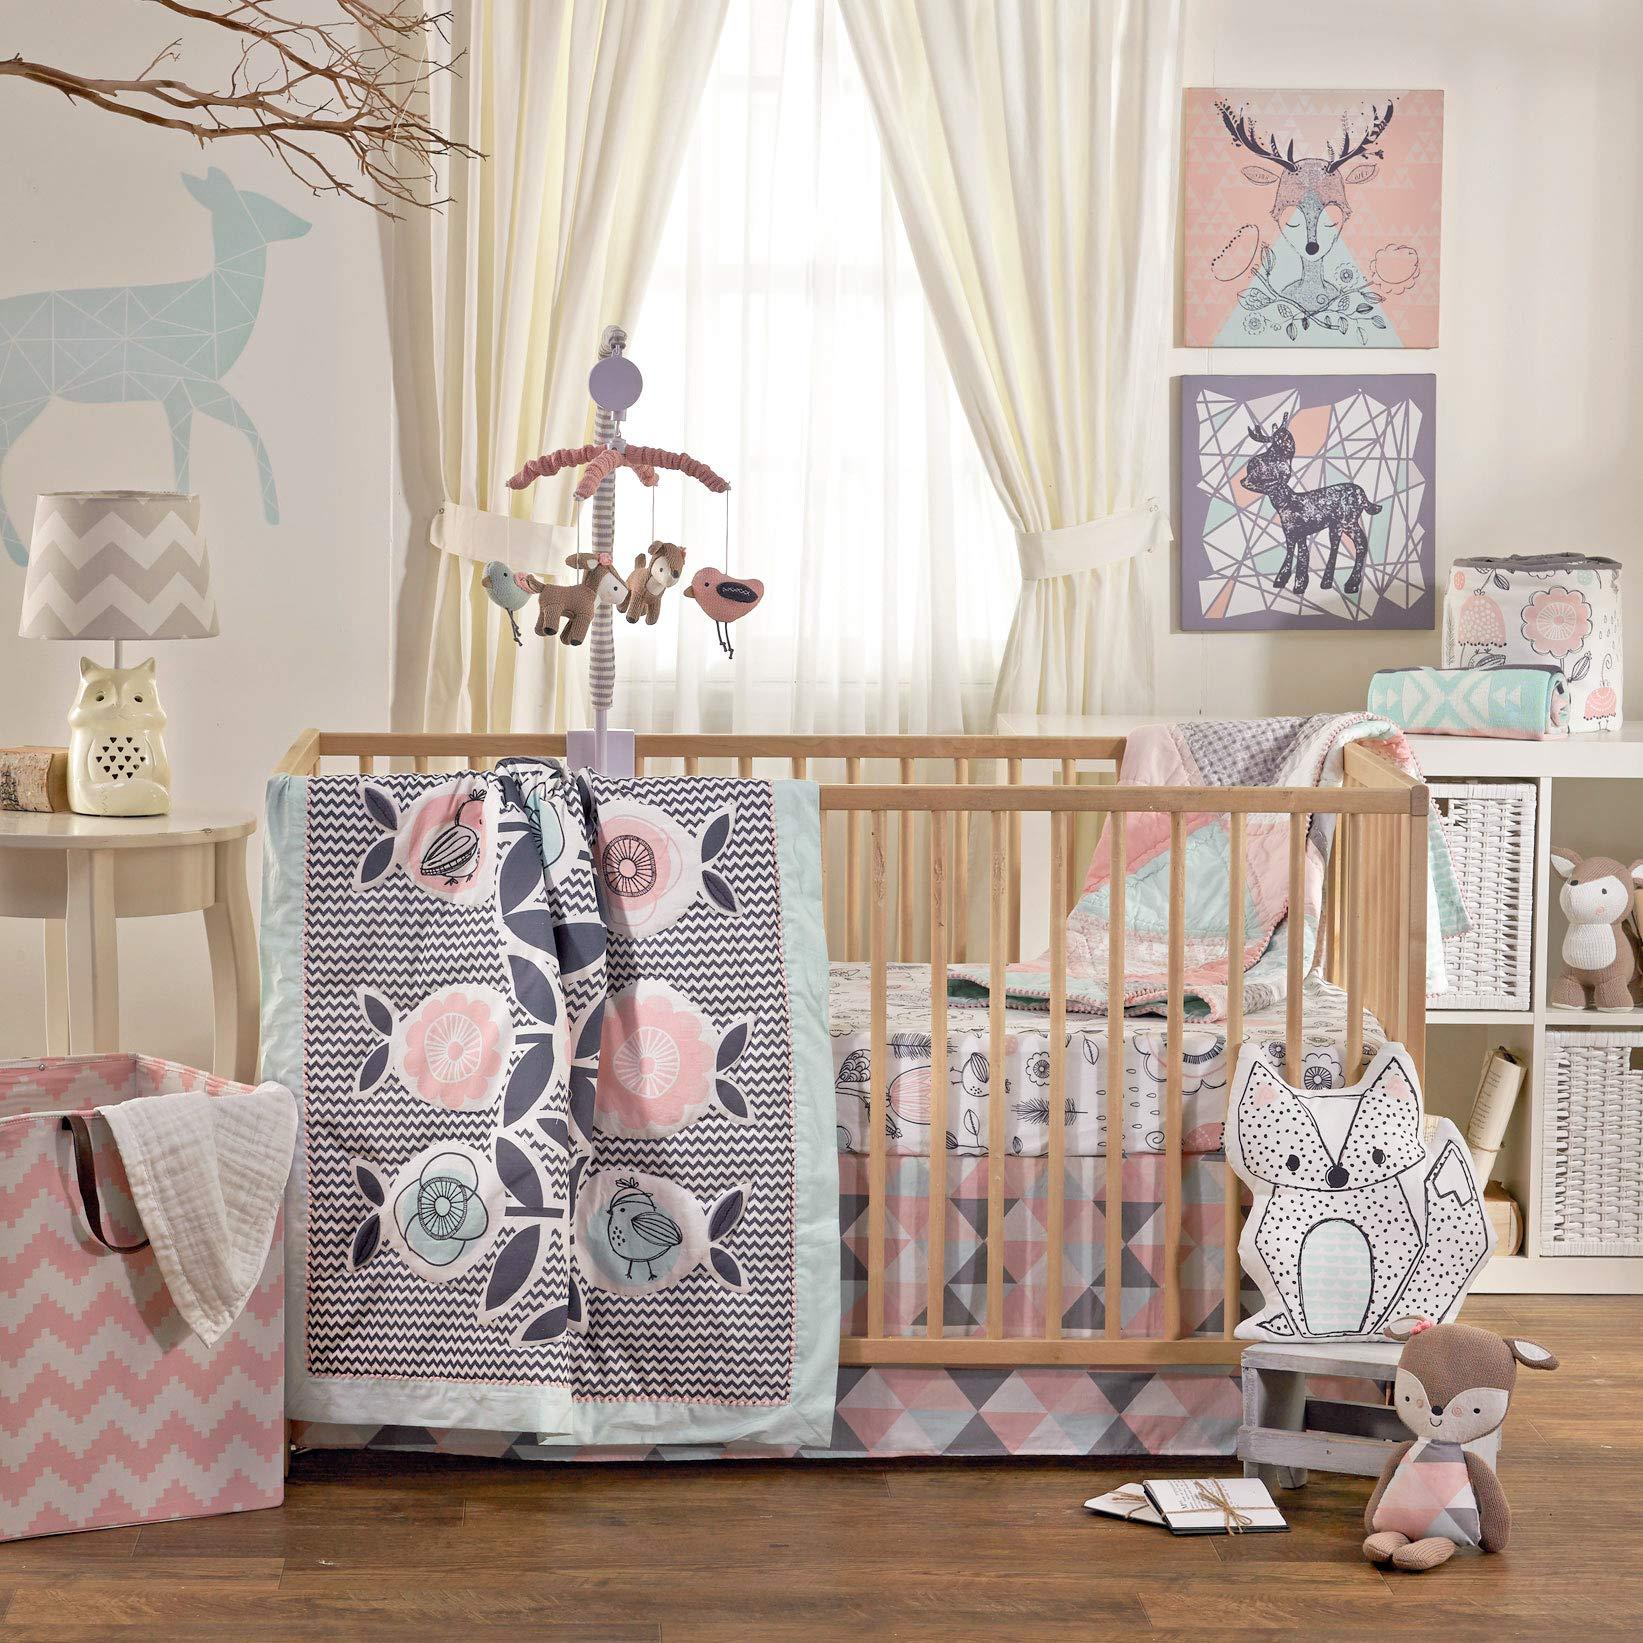 Baby Crib Quilt Patterns Free Patterns